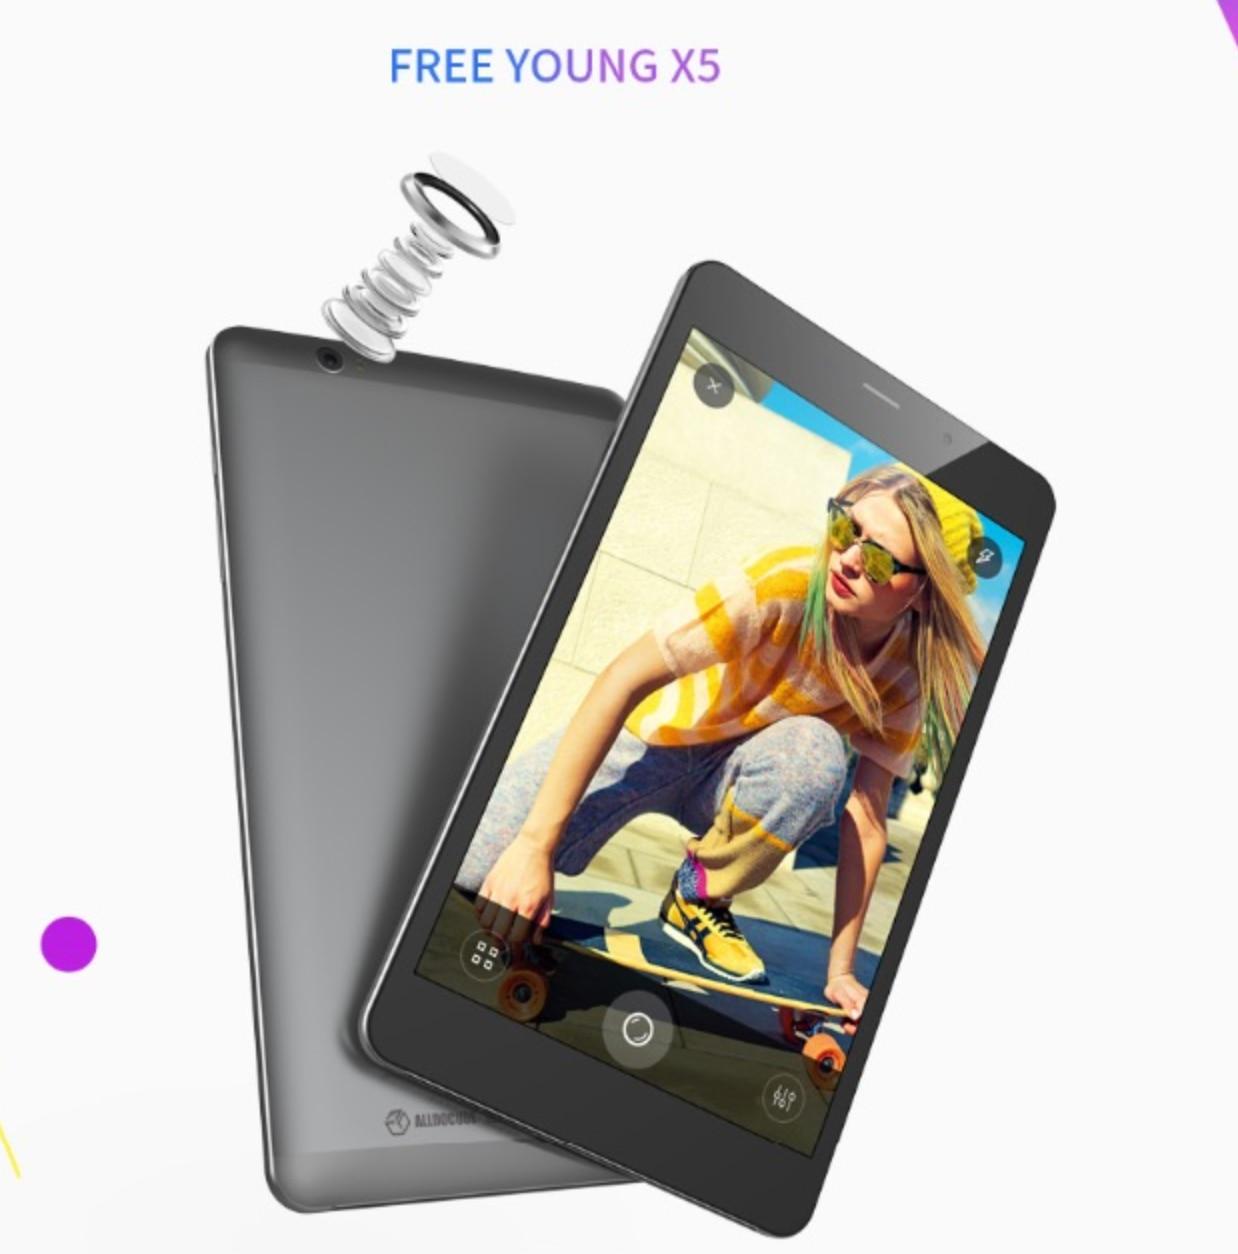 все цены на Newest!!! ALLDOCUBE Young X5/T8 pro 4G Phone Call Tablet PC 8 inch MTK 8783V-CT Octa core 3GB Ram 32GB Rom онлайн